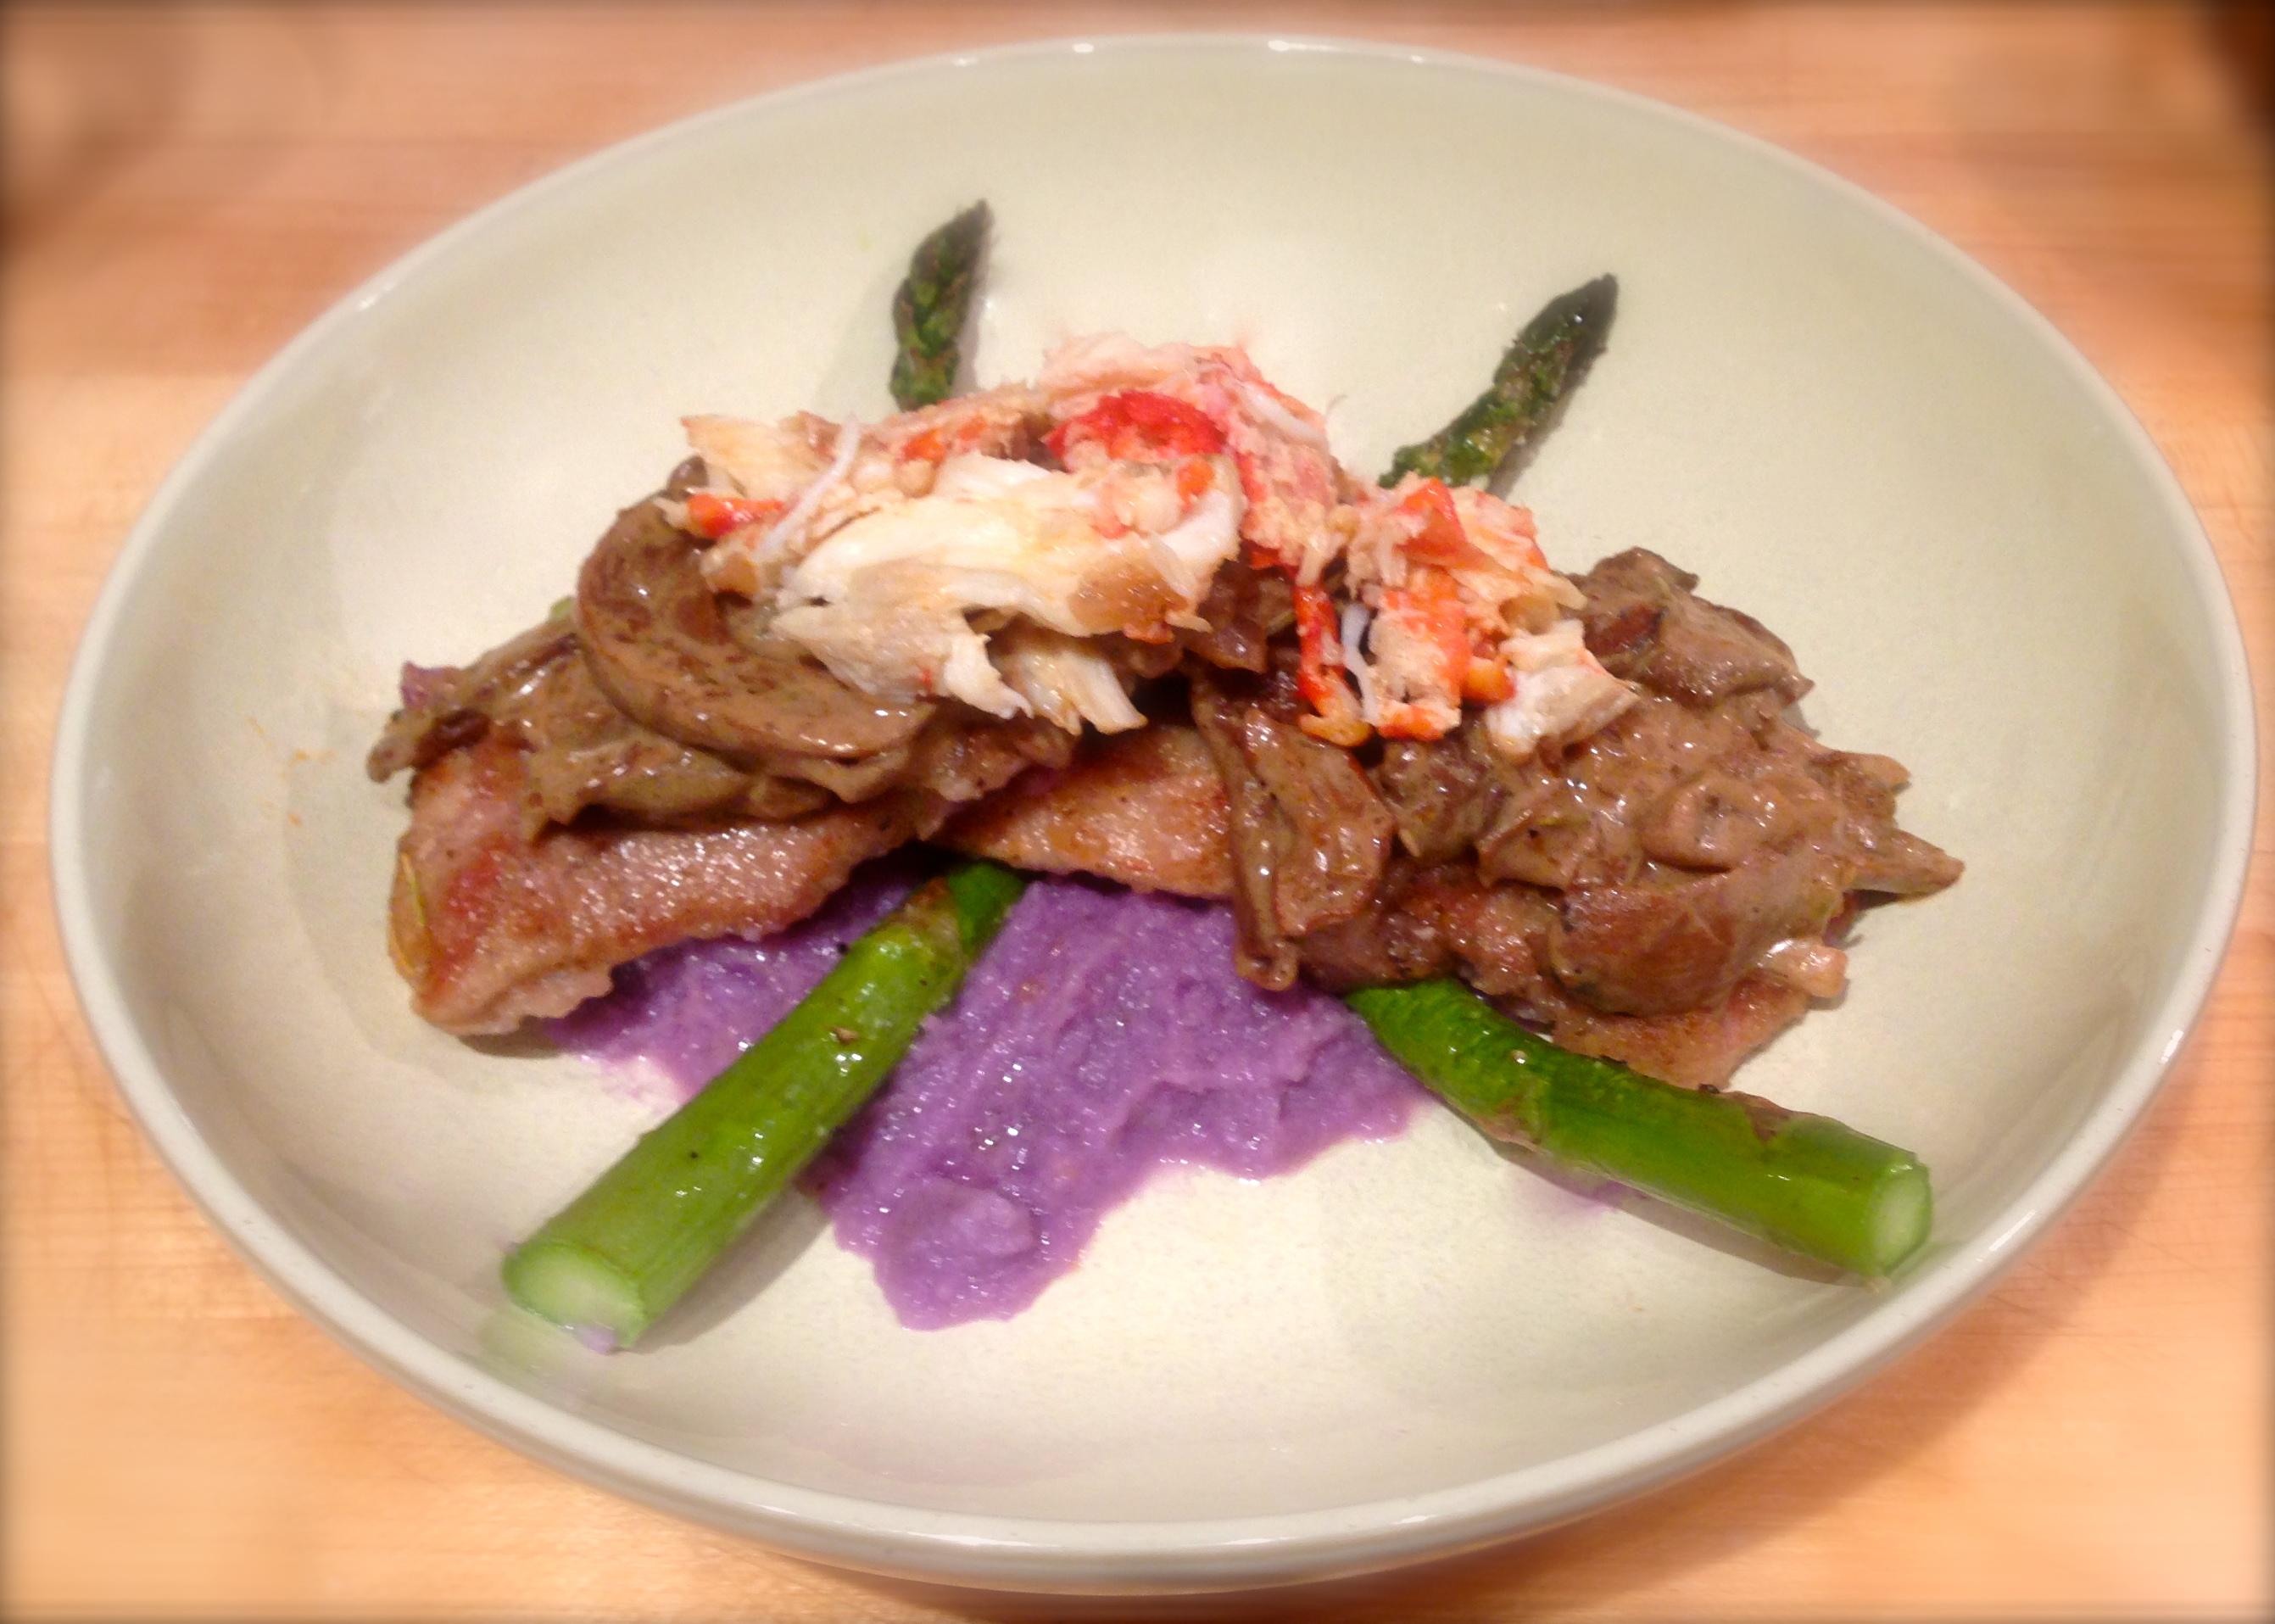 Purple Cauliflower…Oh My! | eatdrinkadventure